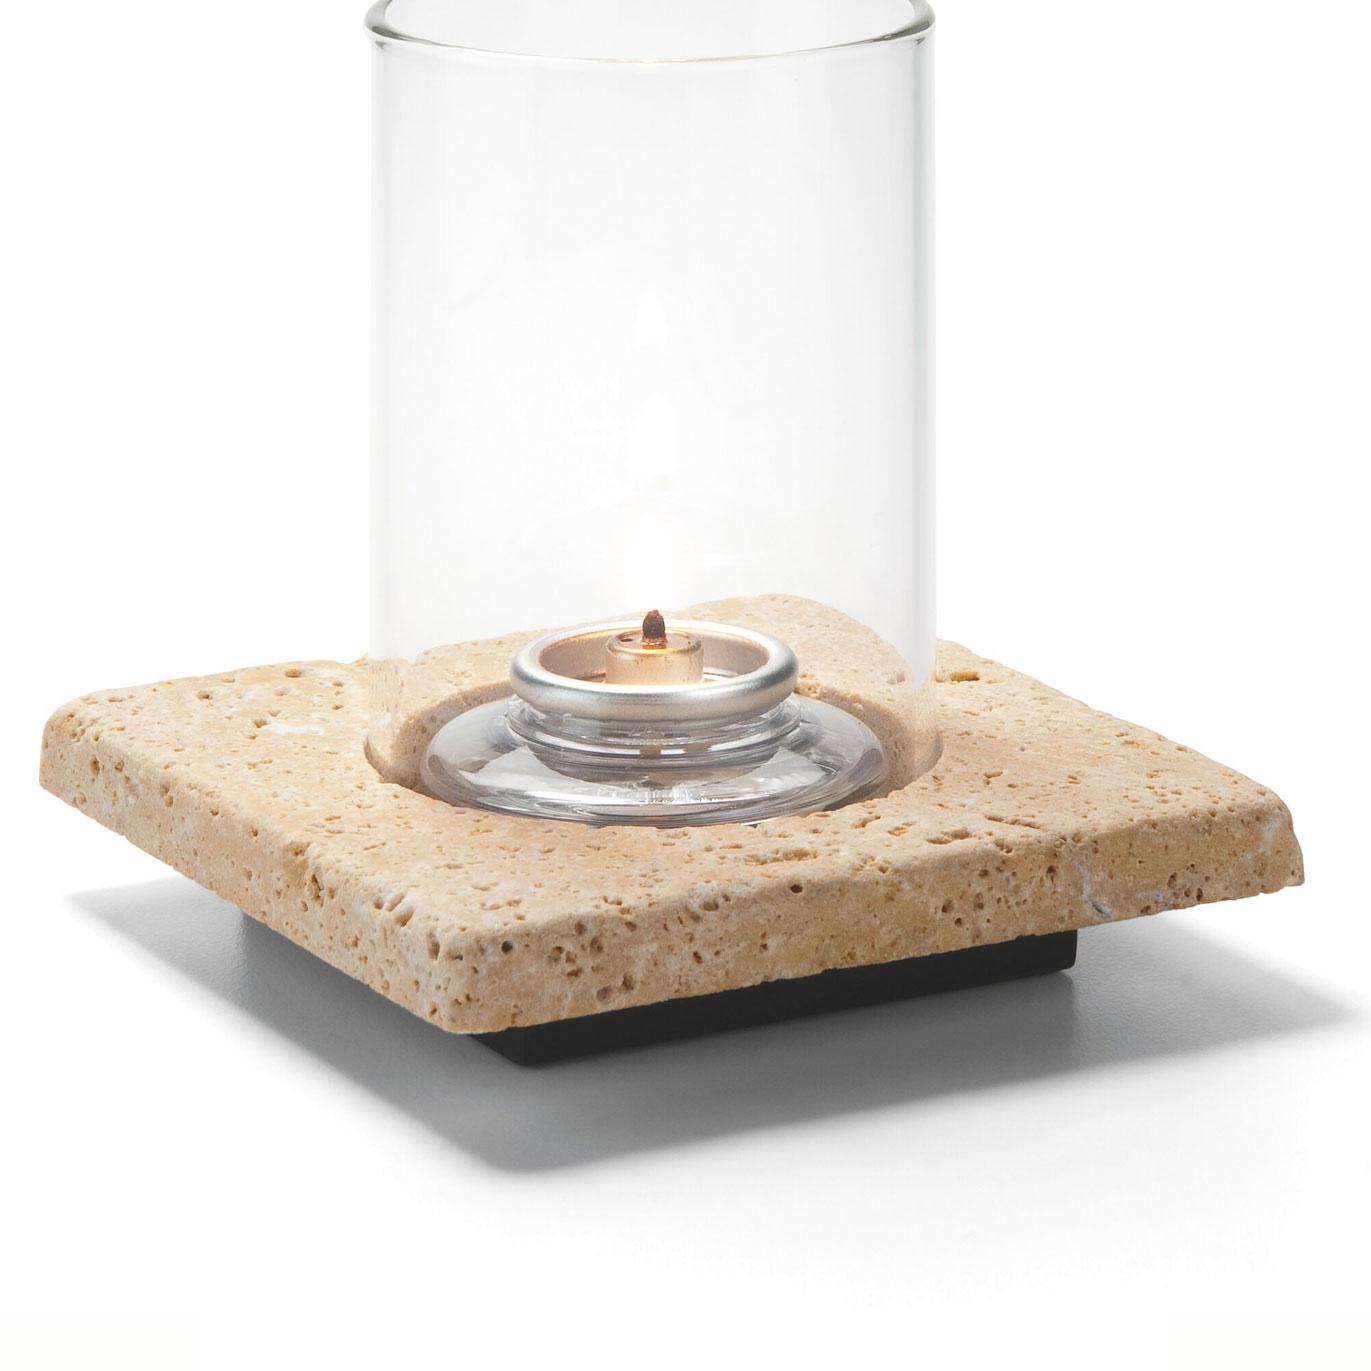 Hollowick ZEN-GTR Square Lamp Base, Single, Stone, Gold Travertine, 4x4.88-in